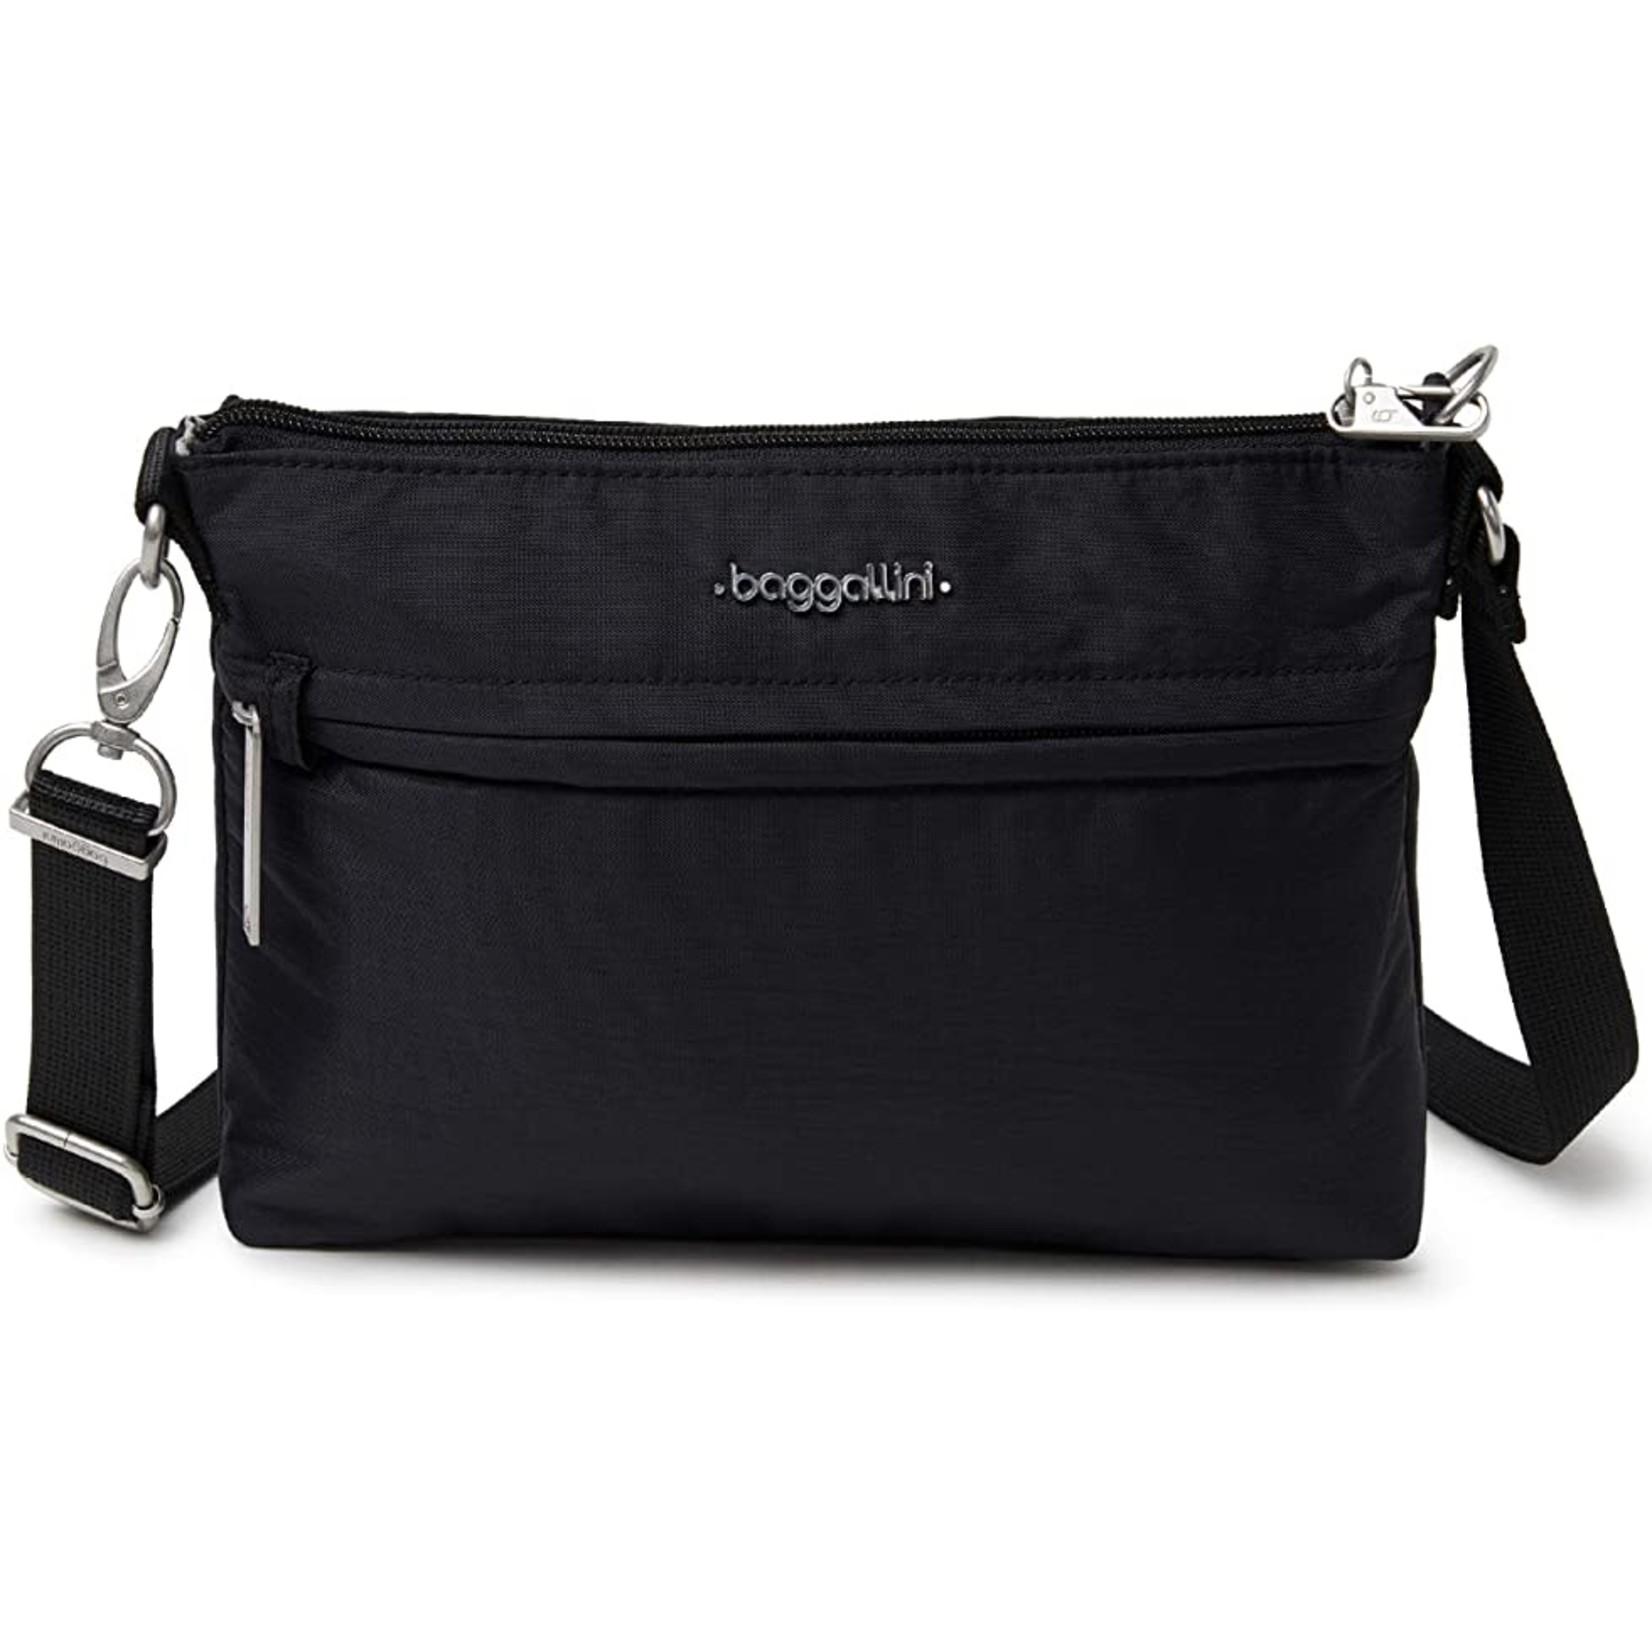 Baggallini Anti-Theft Memento Crossbody Bag - Black